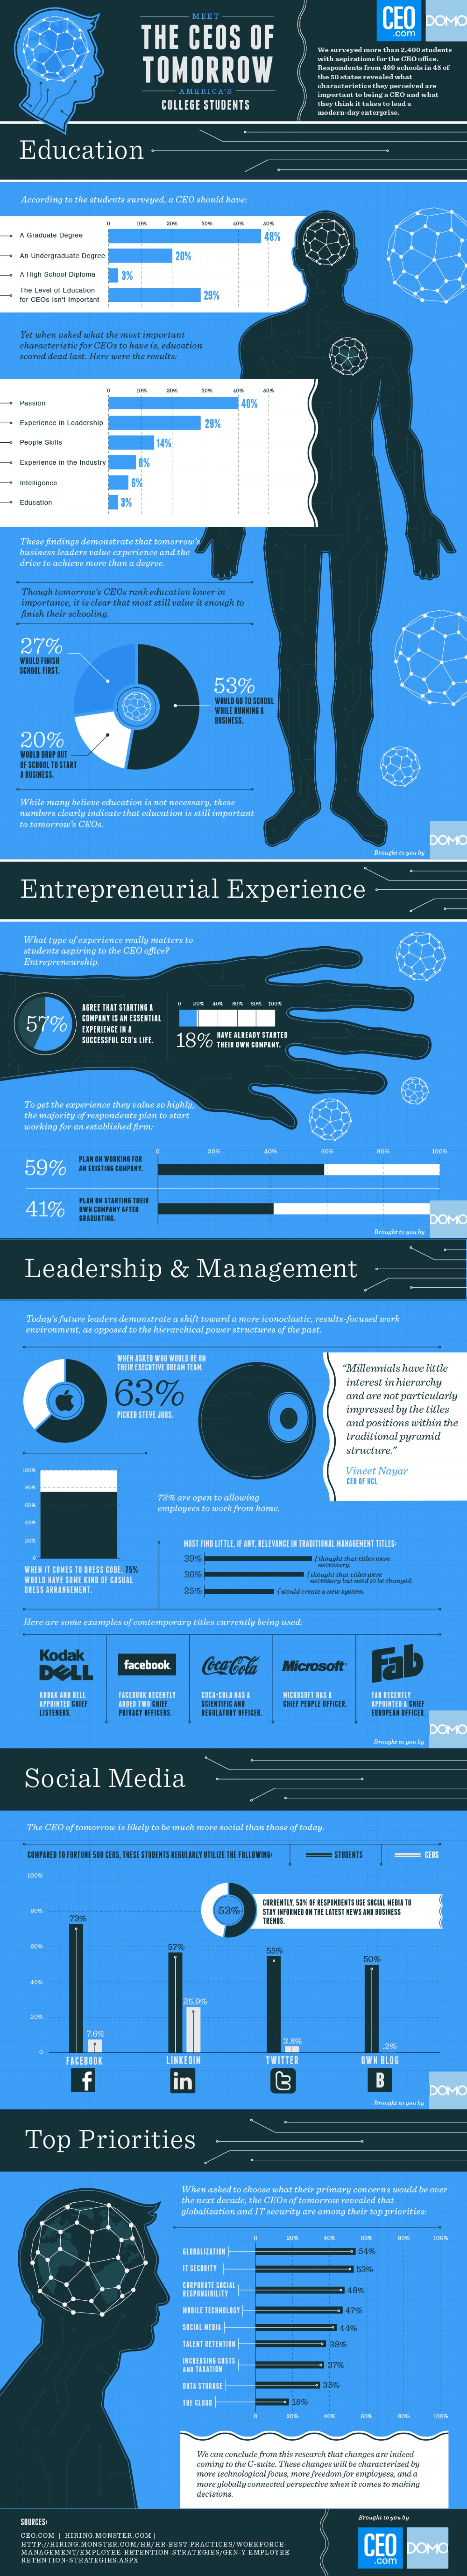 2. The CEOs of Tomorrow